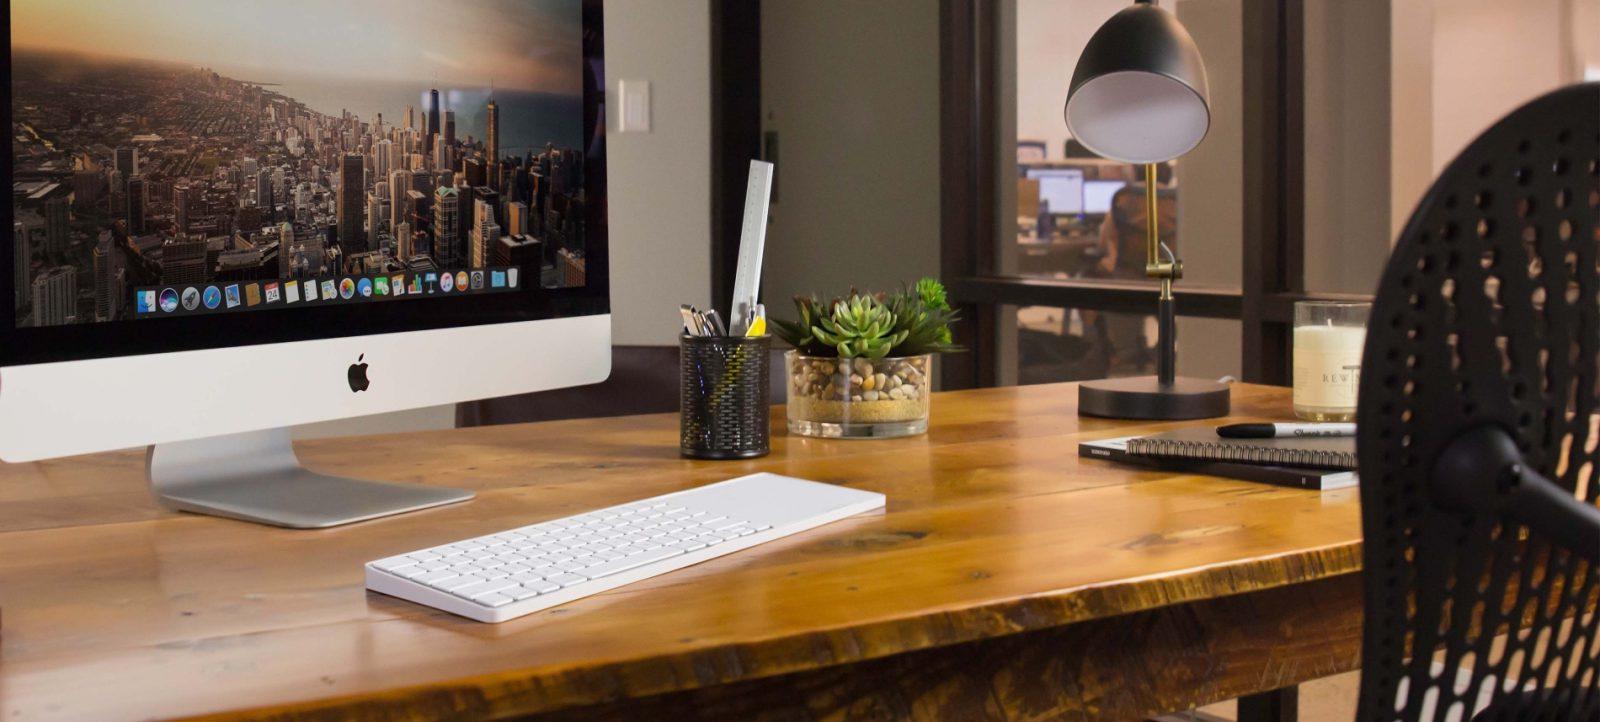 Apple Magic Keyboard 2 MLA22 - Беспроводная клавиатура для Apple с Русской раскладкой